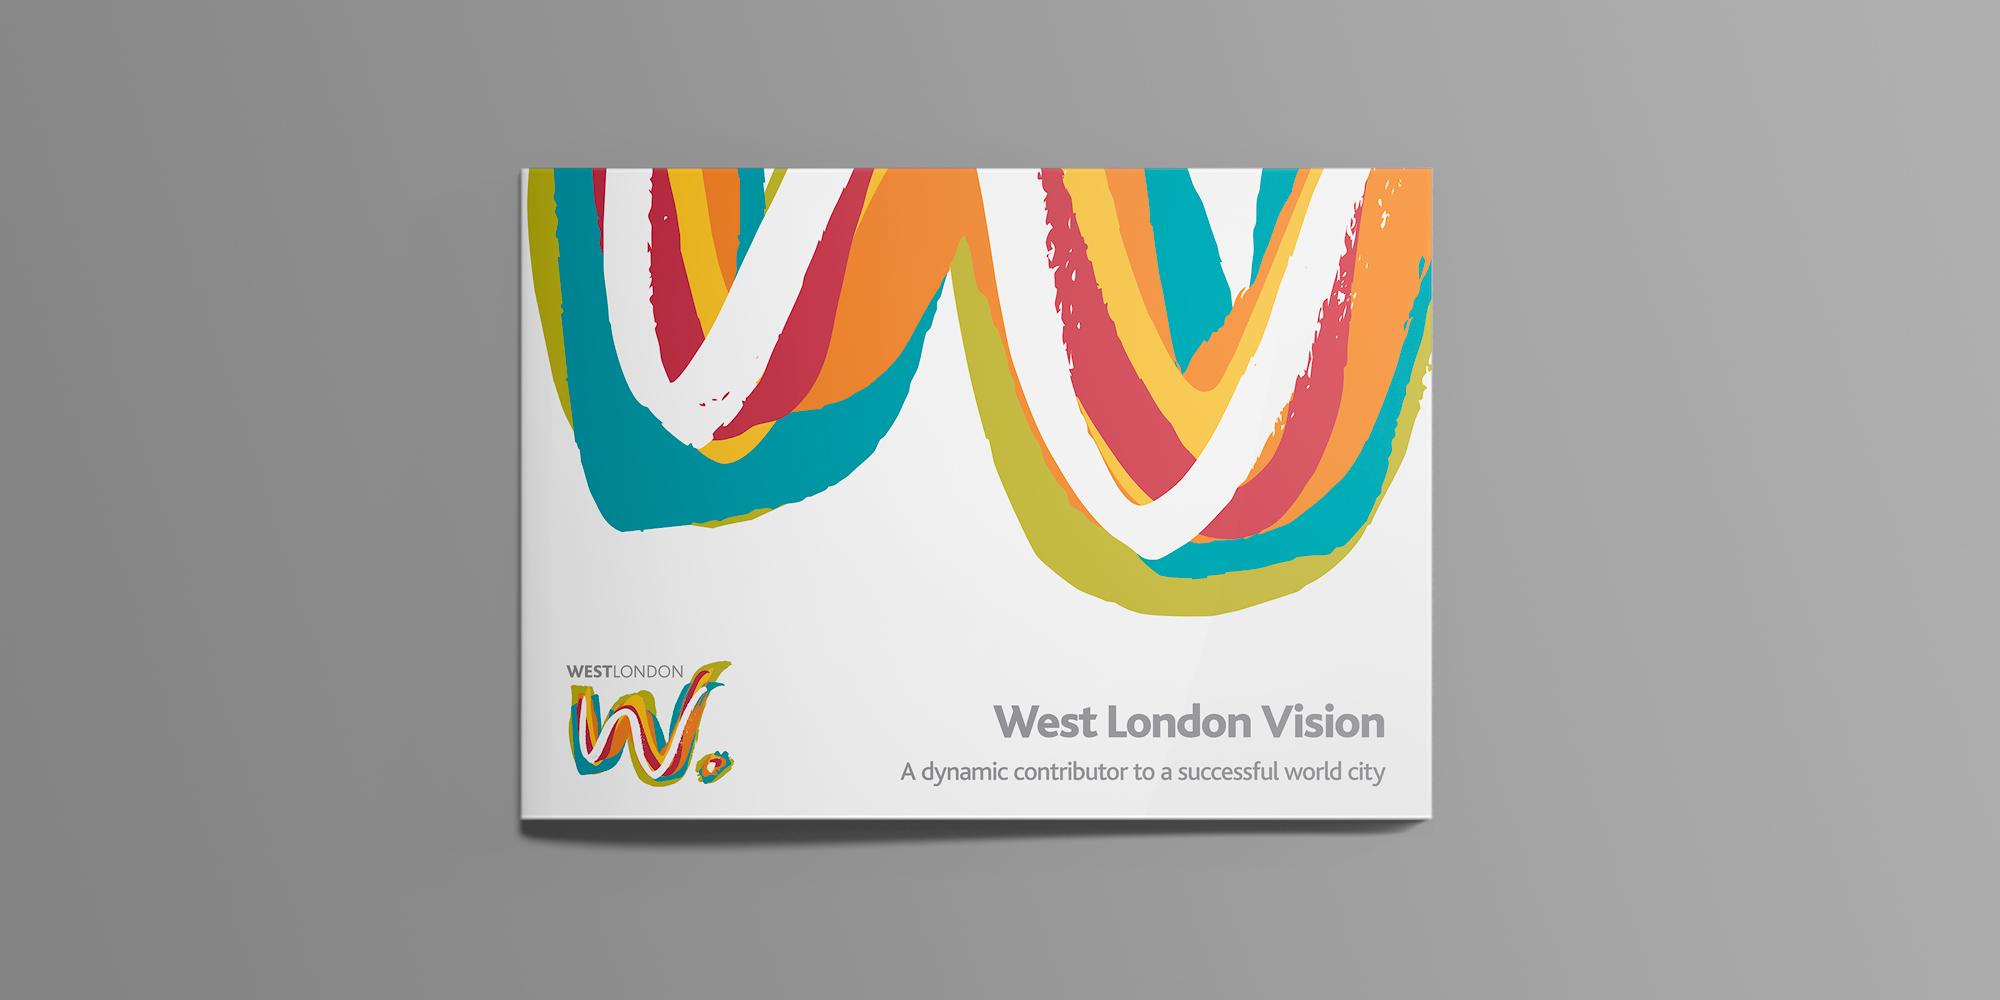 West London Alliance7